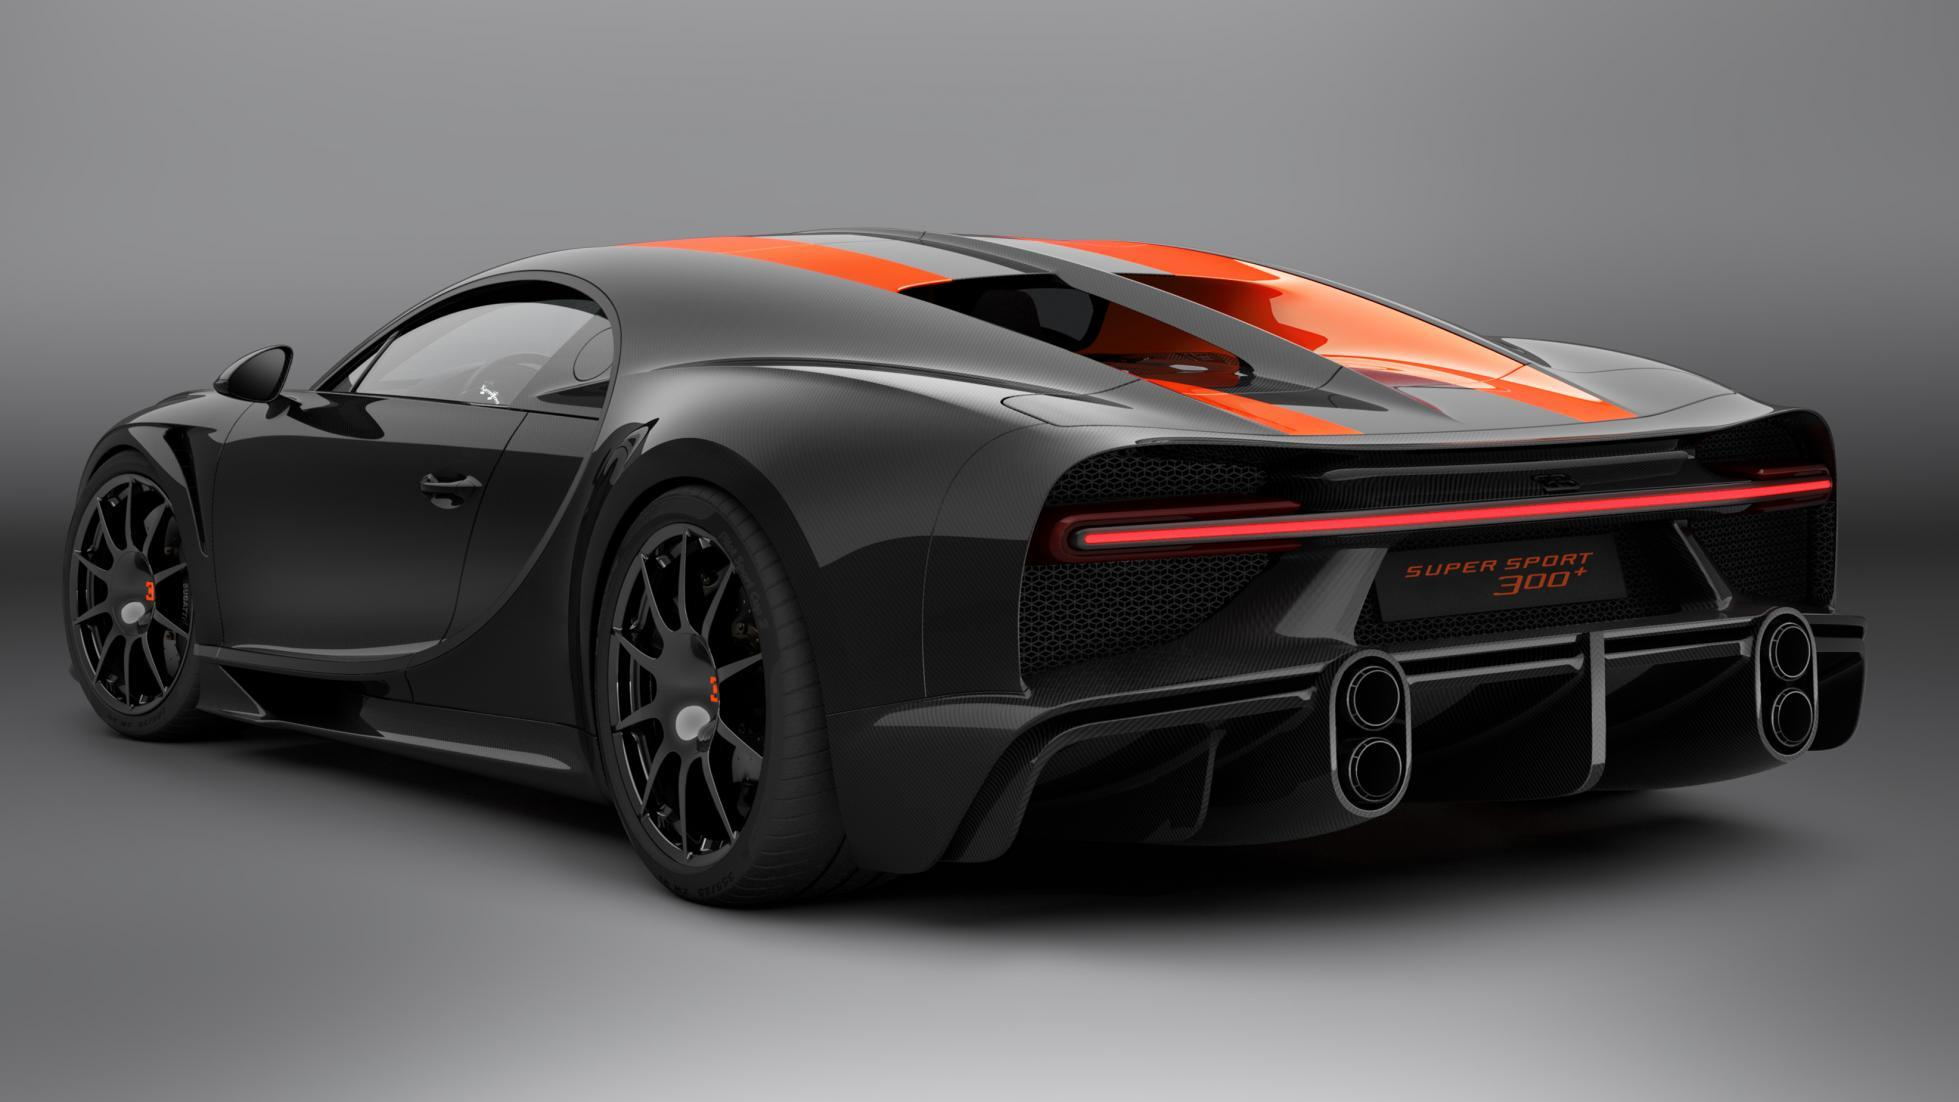 Bugatti Super Sport >> Bugatti Chiron Super Sport 300 Laptimes Specs Performance